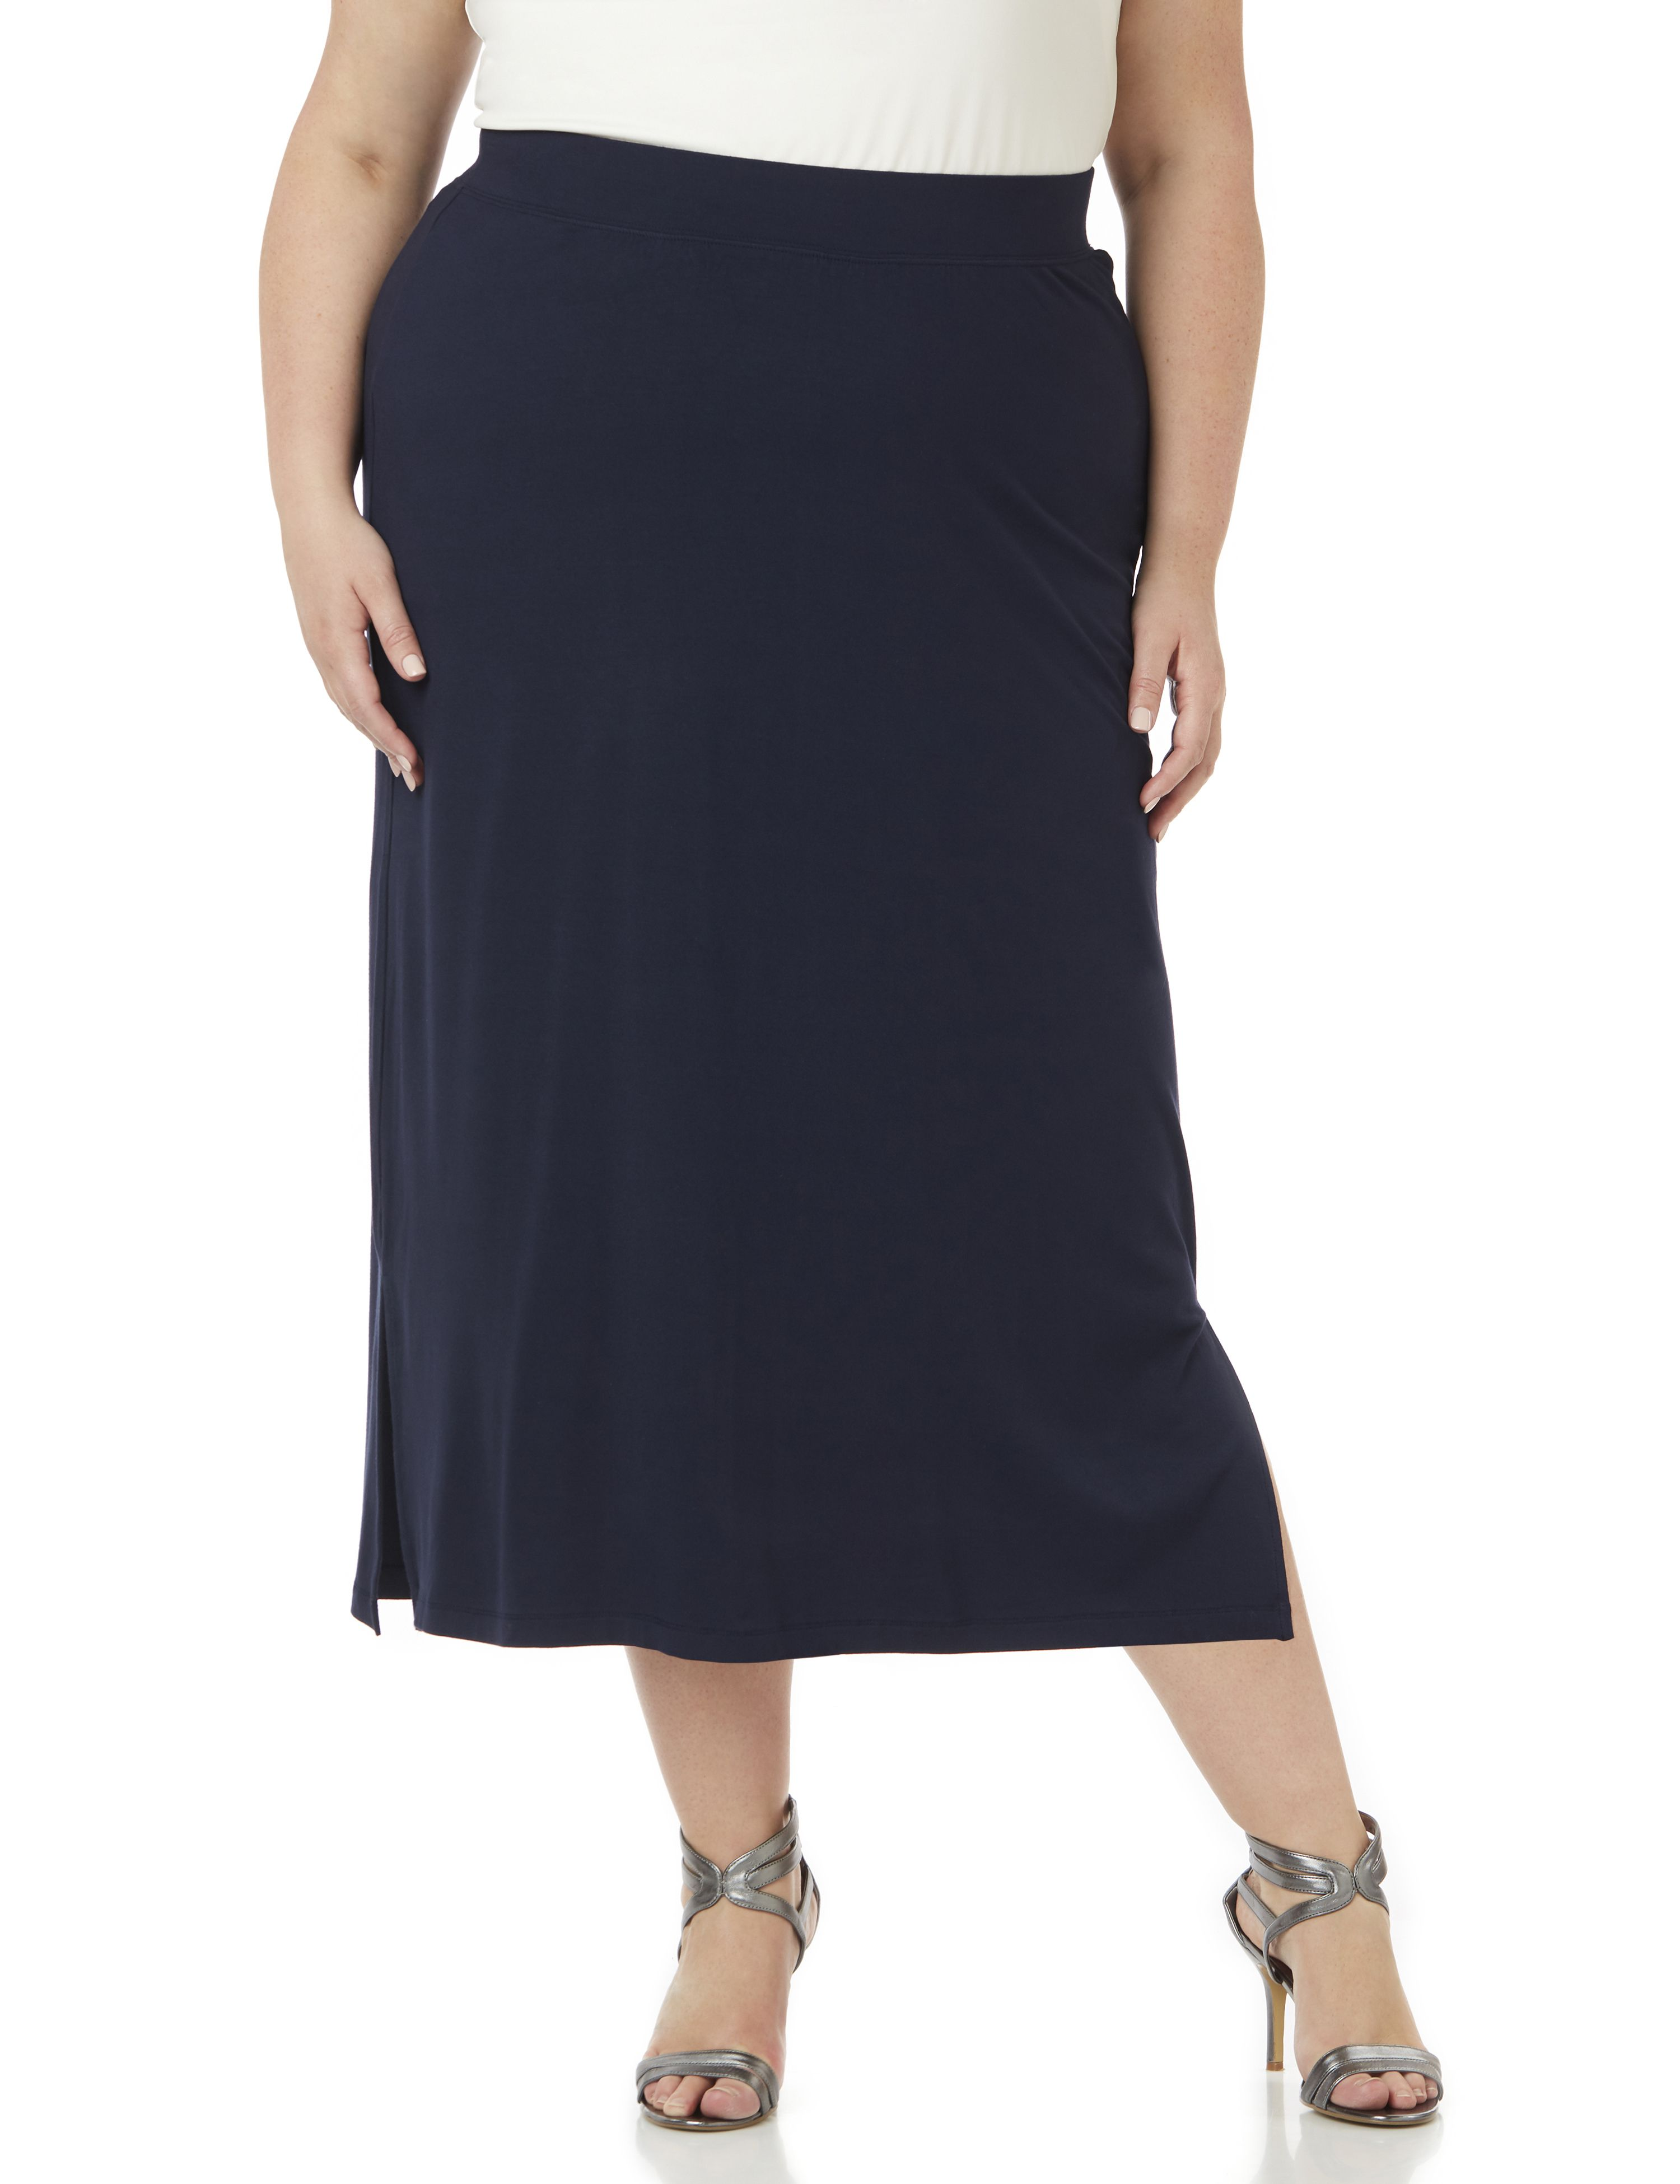 1950s Skirts; Pinup, Poodle, Pencil, Swing & Circle Skirts AnyWear Midi Skirt $46.99 AT vintagedancer.com